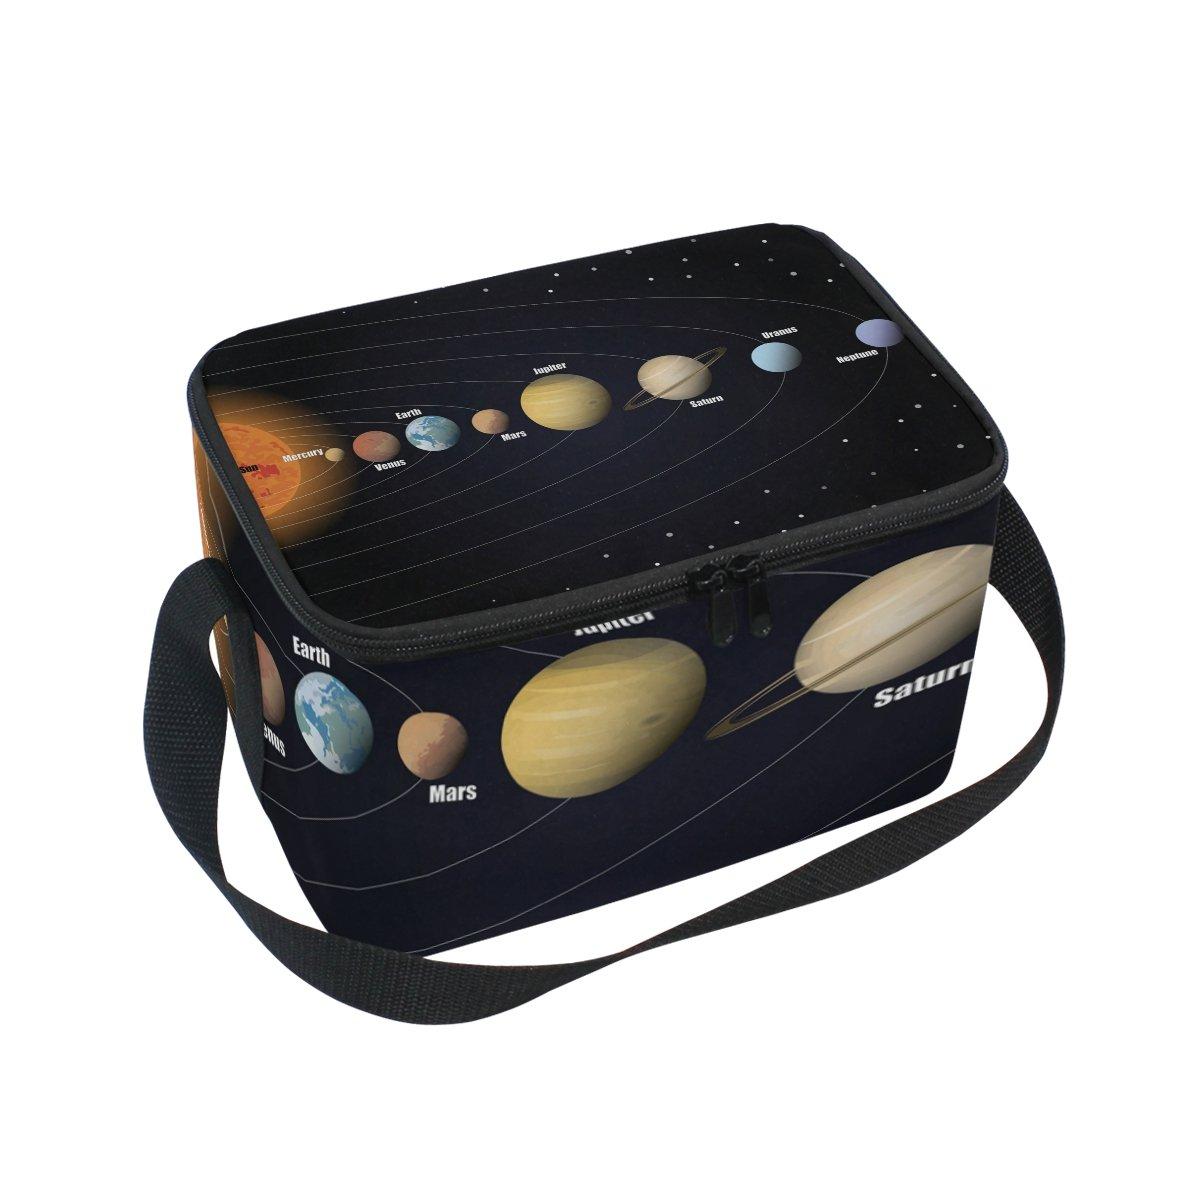 LORVIES Diagram Of Solar System Insulated Lunch Bag Cooler Reusable Tote Bag with Adjustable Shoulder Strap for Women Men